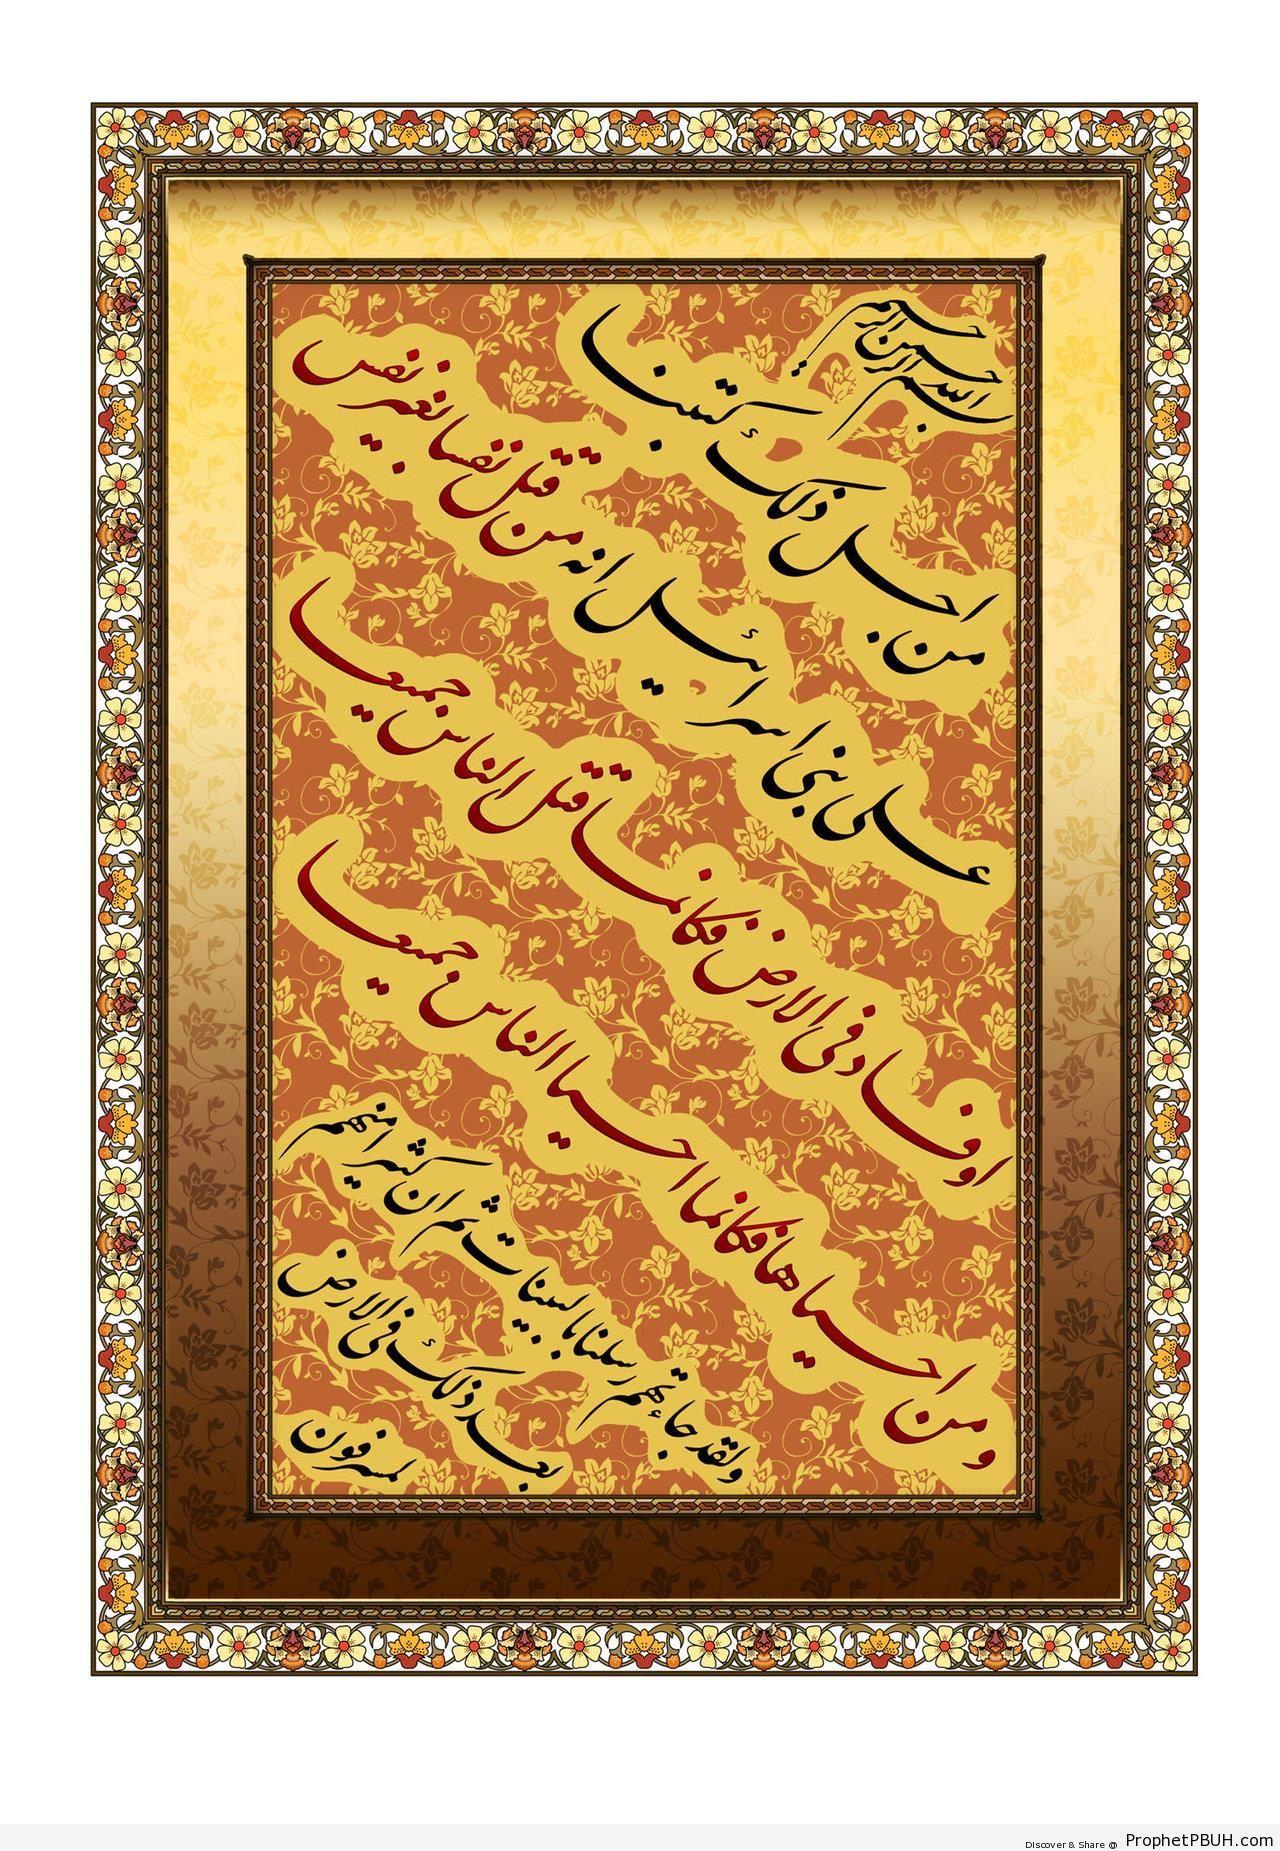 Surat al-Maidah 5-32 in Nastaliq Script - Islamic Calligraphy and Typography